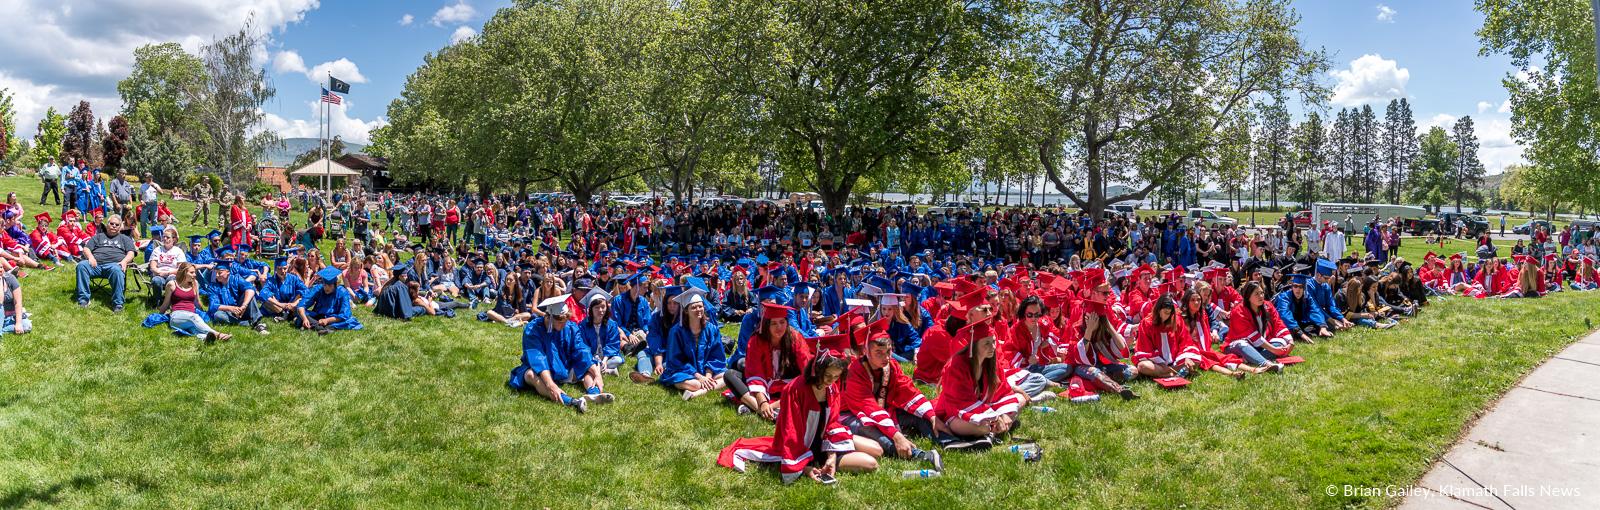 GraduationSensation2019-KFN-3090.jpg